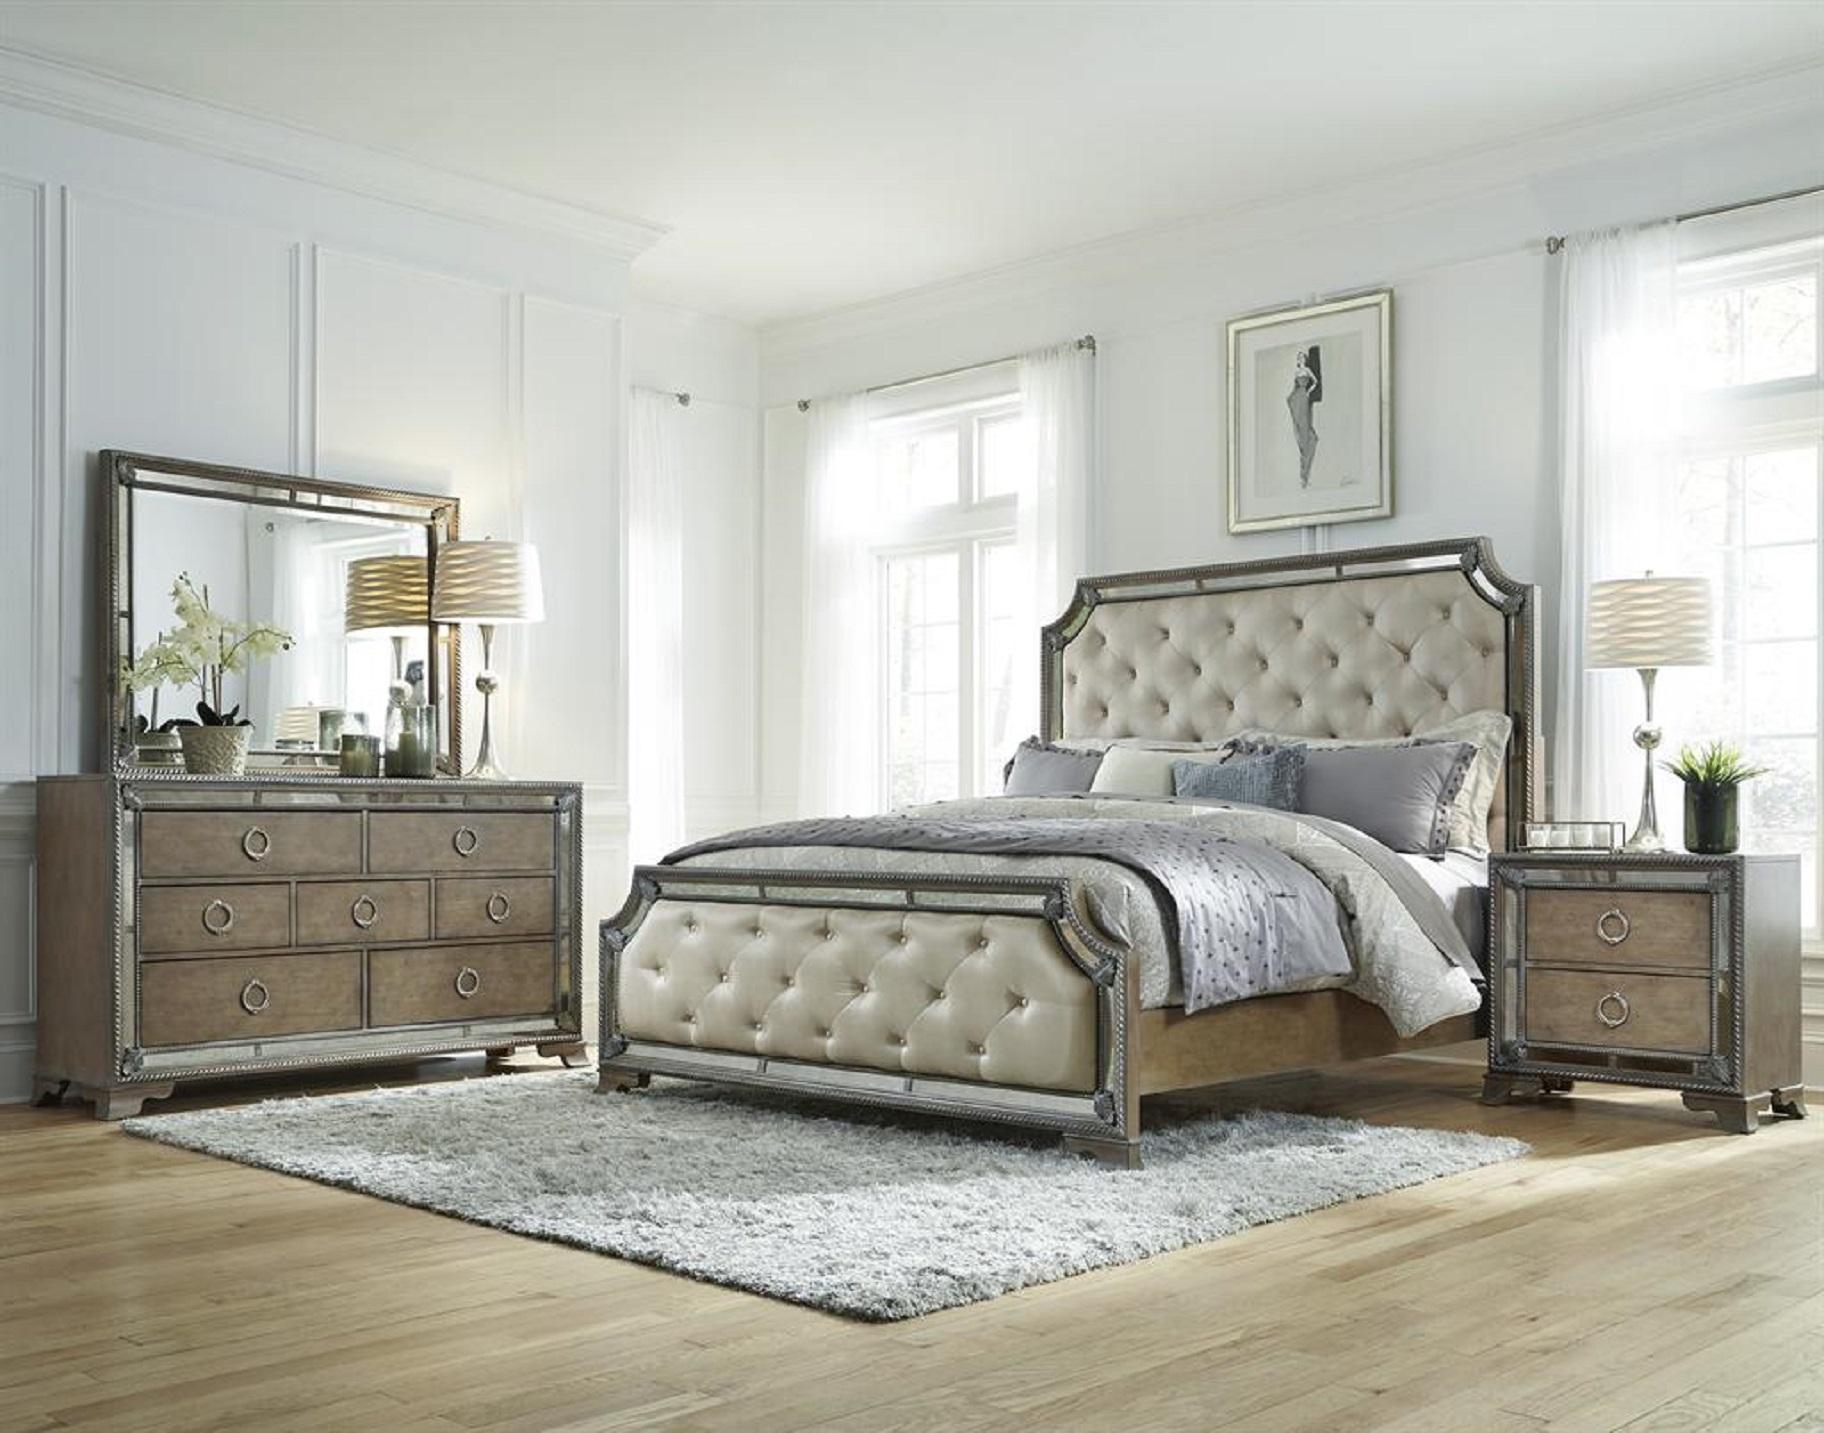 mirrored furniture bedroom set photo - 3